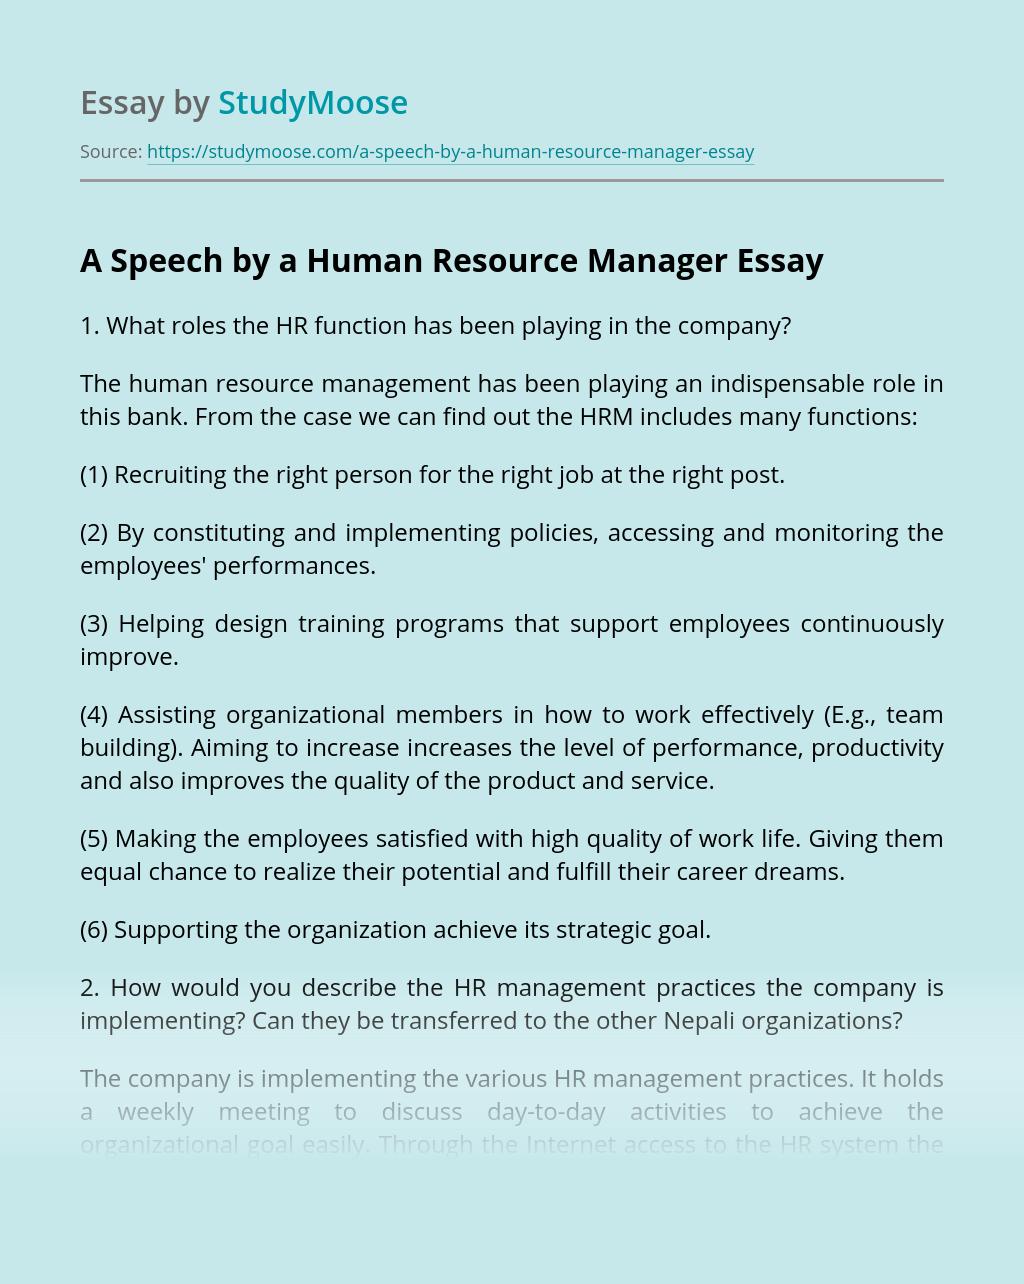 A Speech by a Human Resource Manager